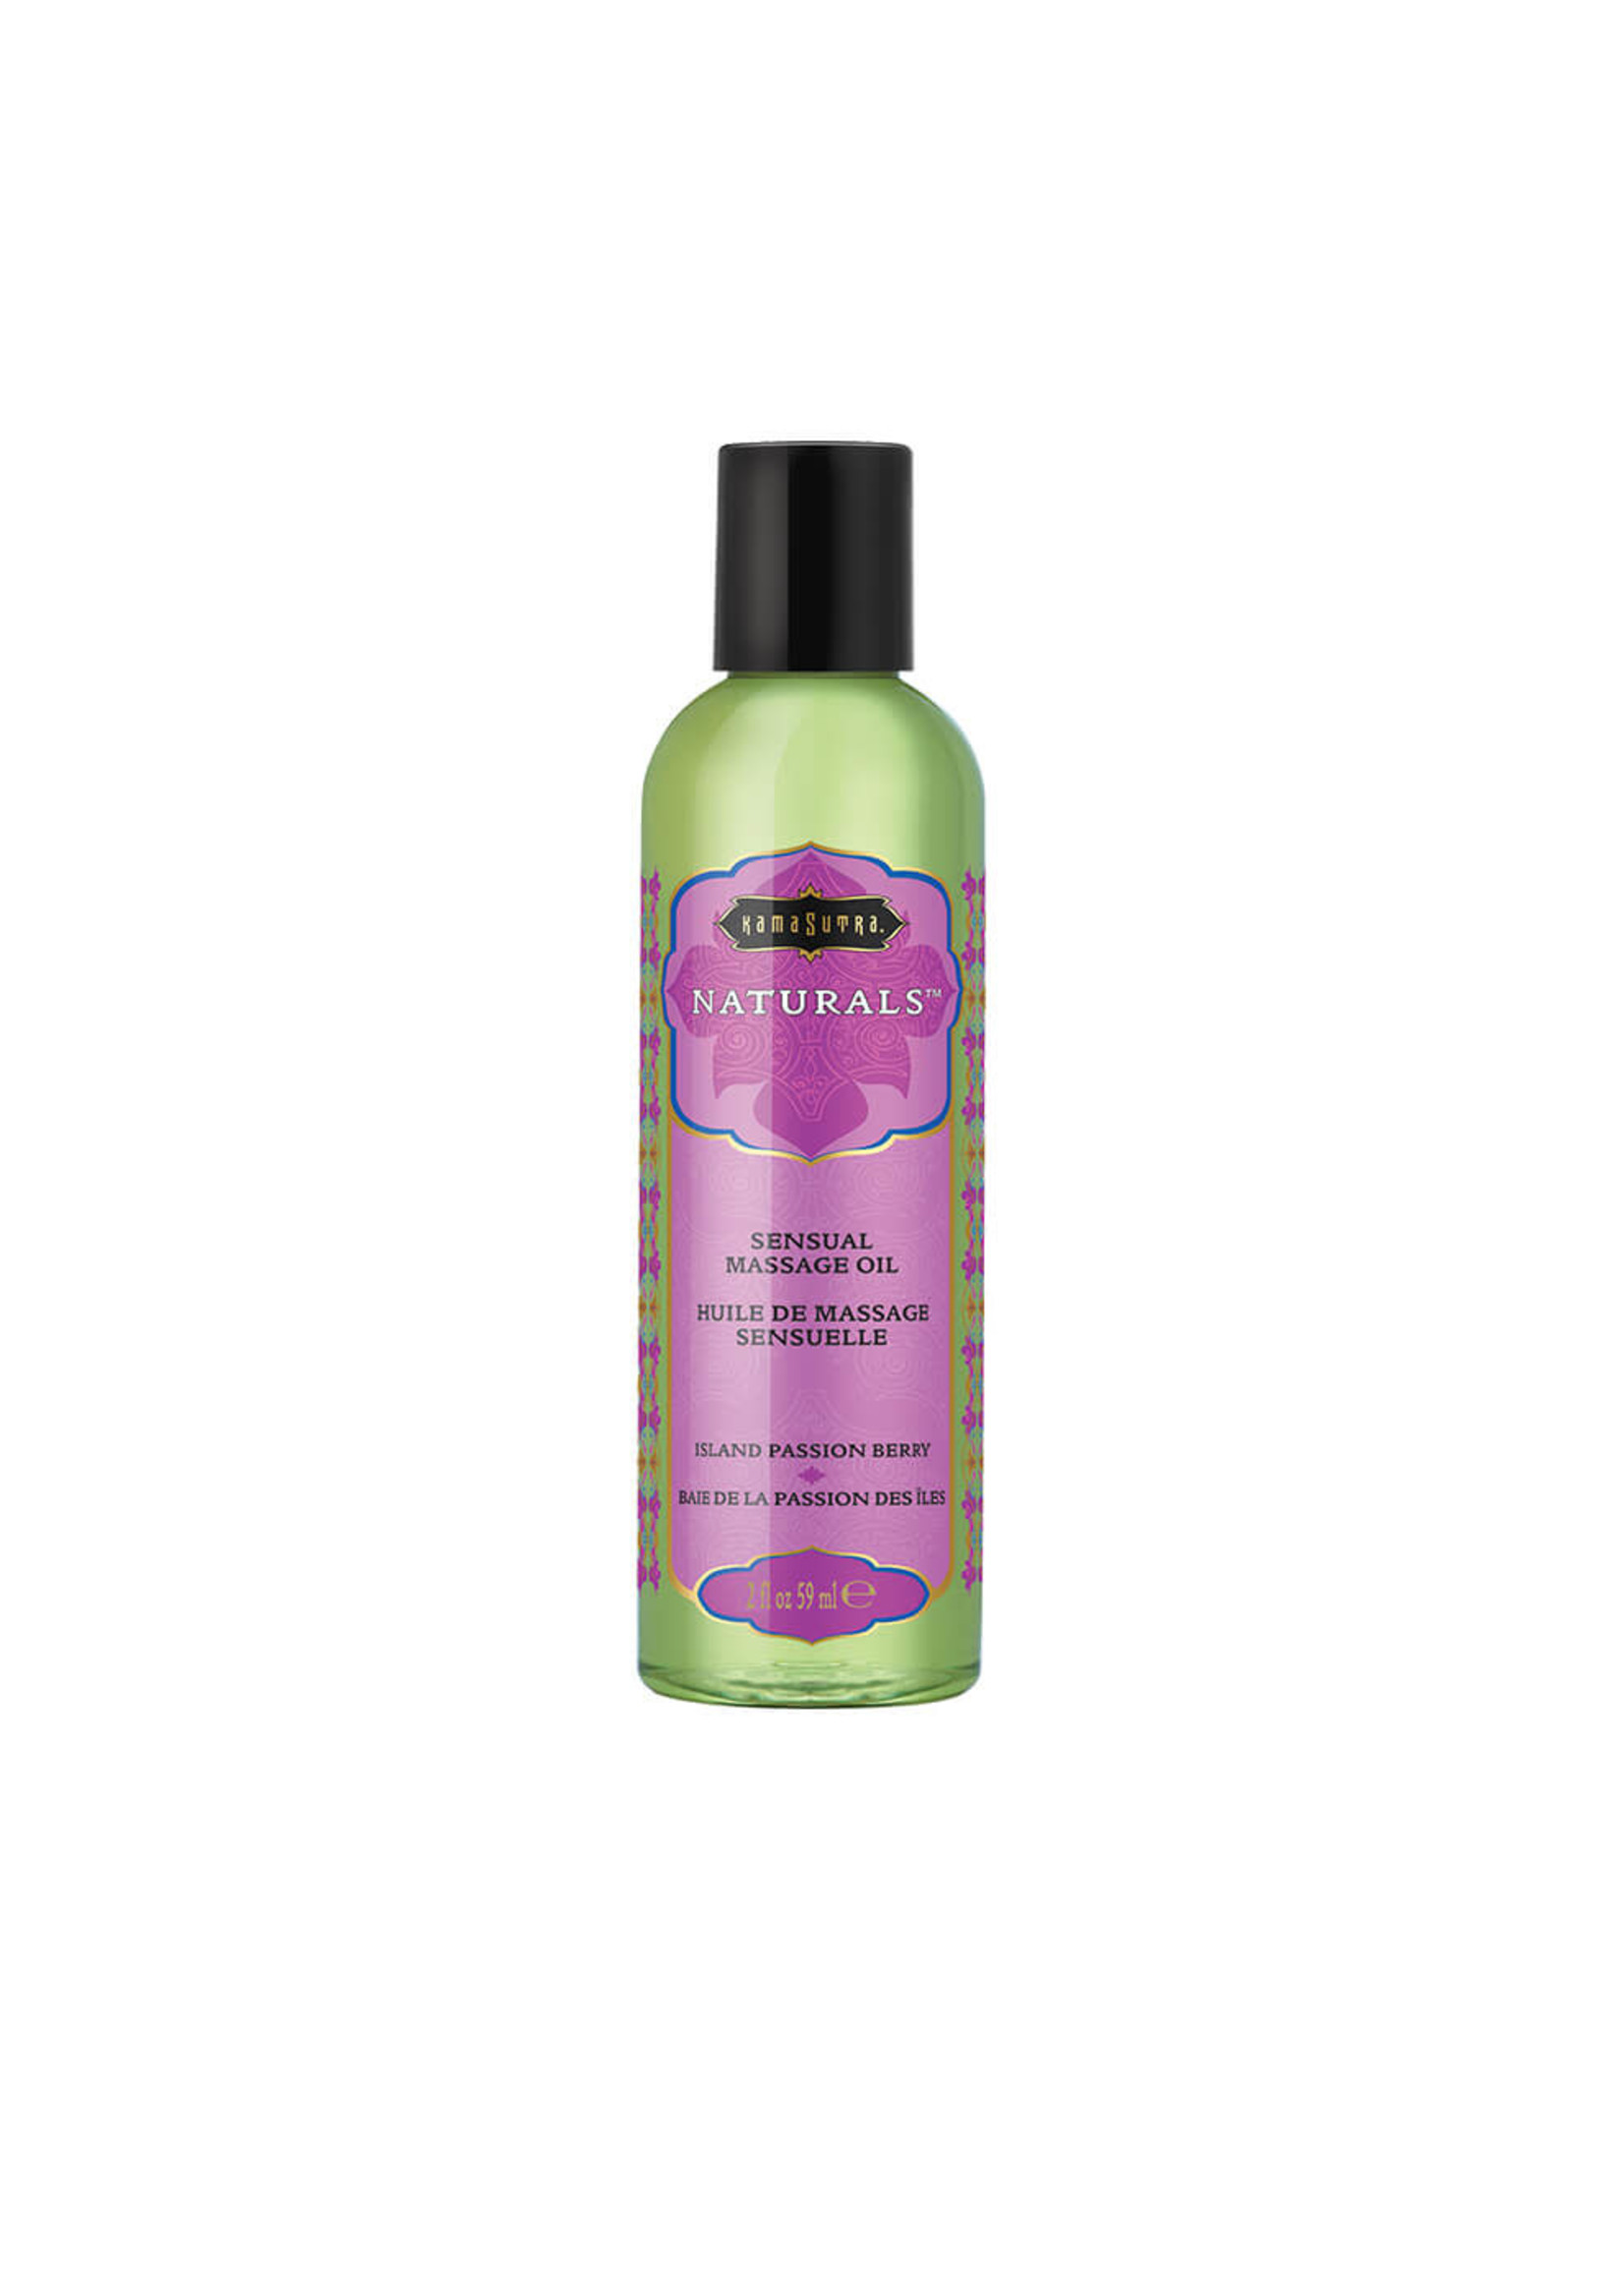 Kama Sutra Naturals Massage Oil 2 oz